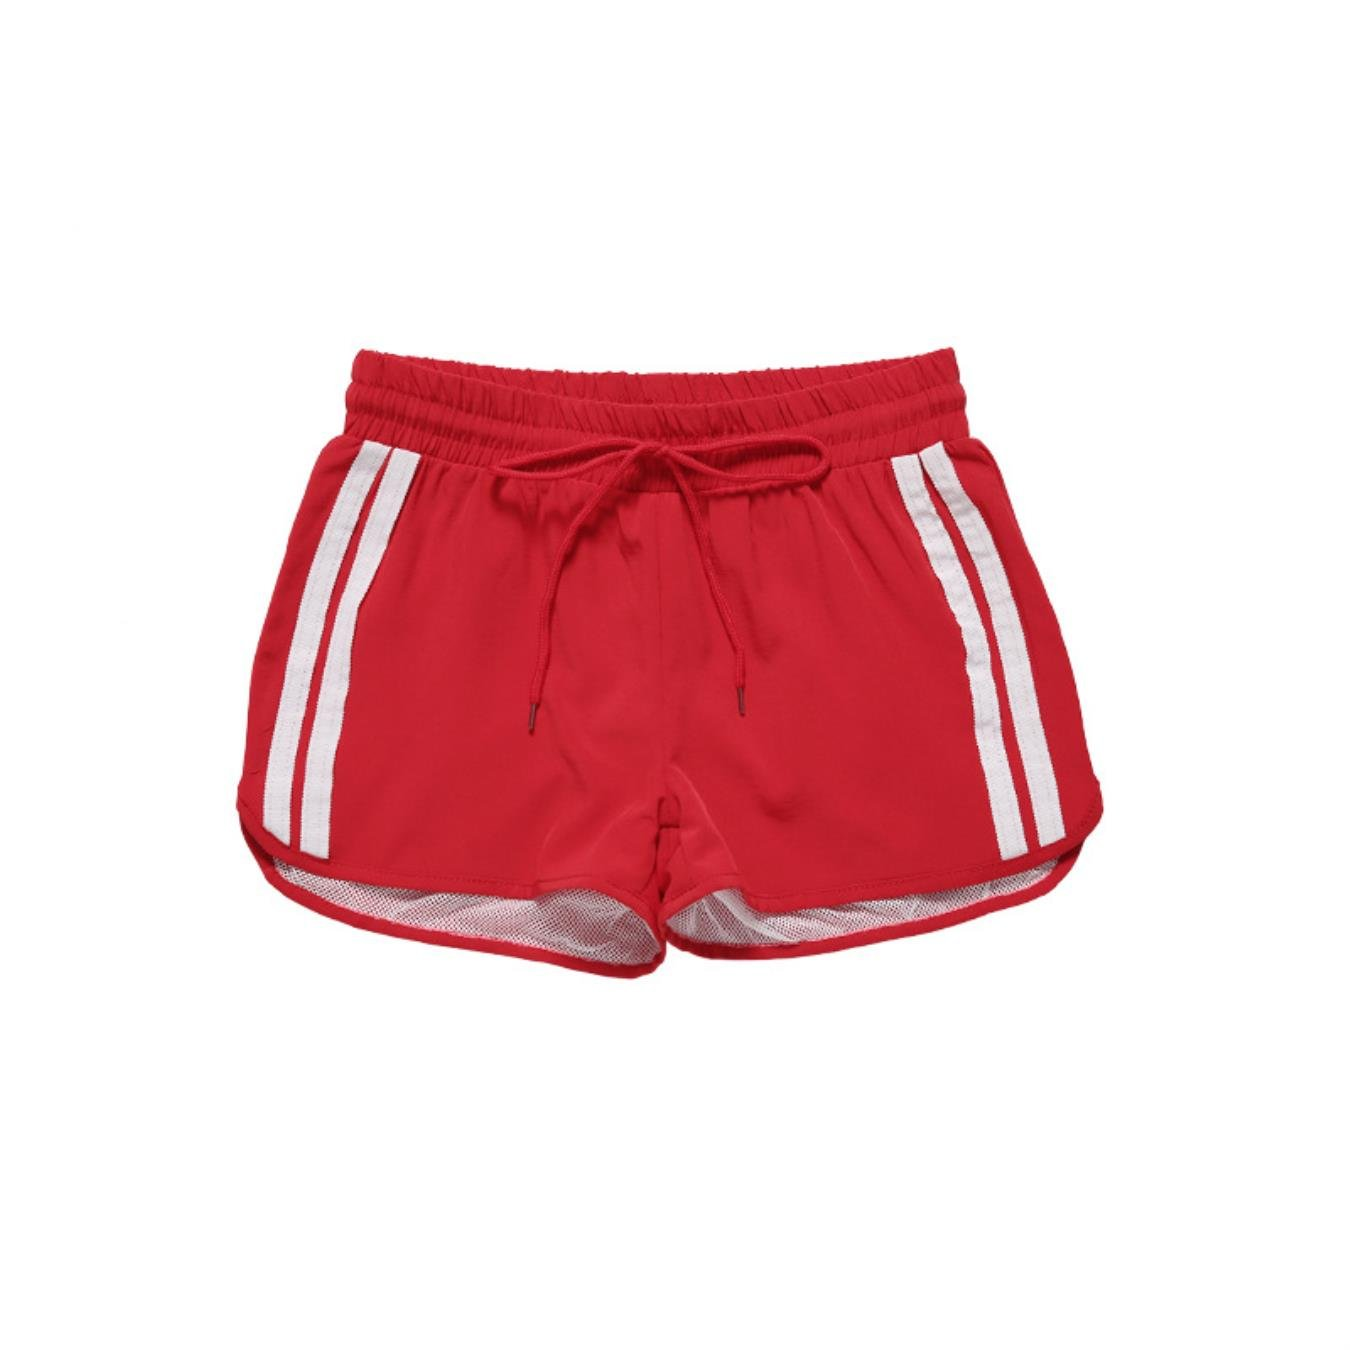 COESV Women Quick Drying Fitness 2 in 1 Grid Stripe Running Shorts